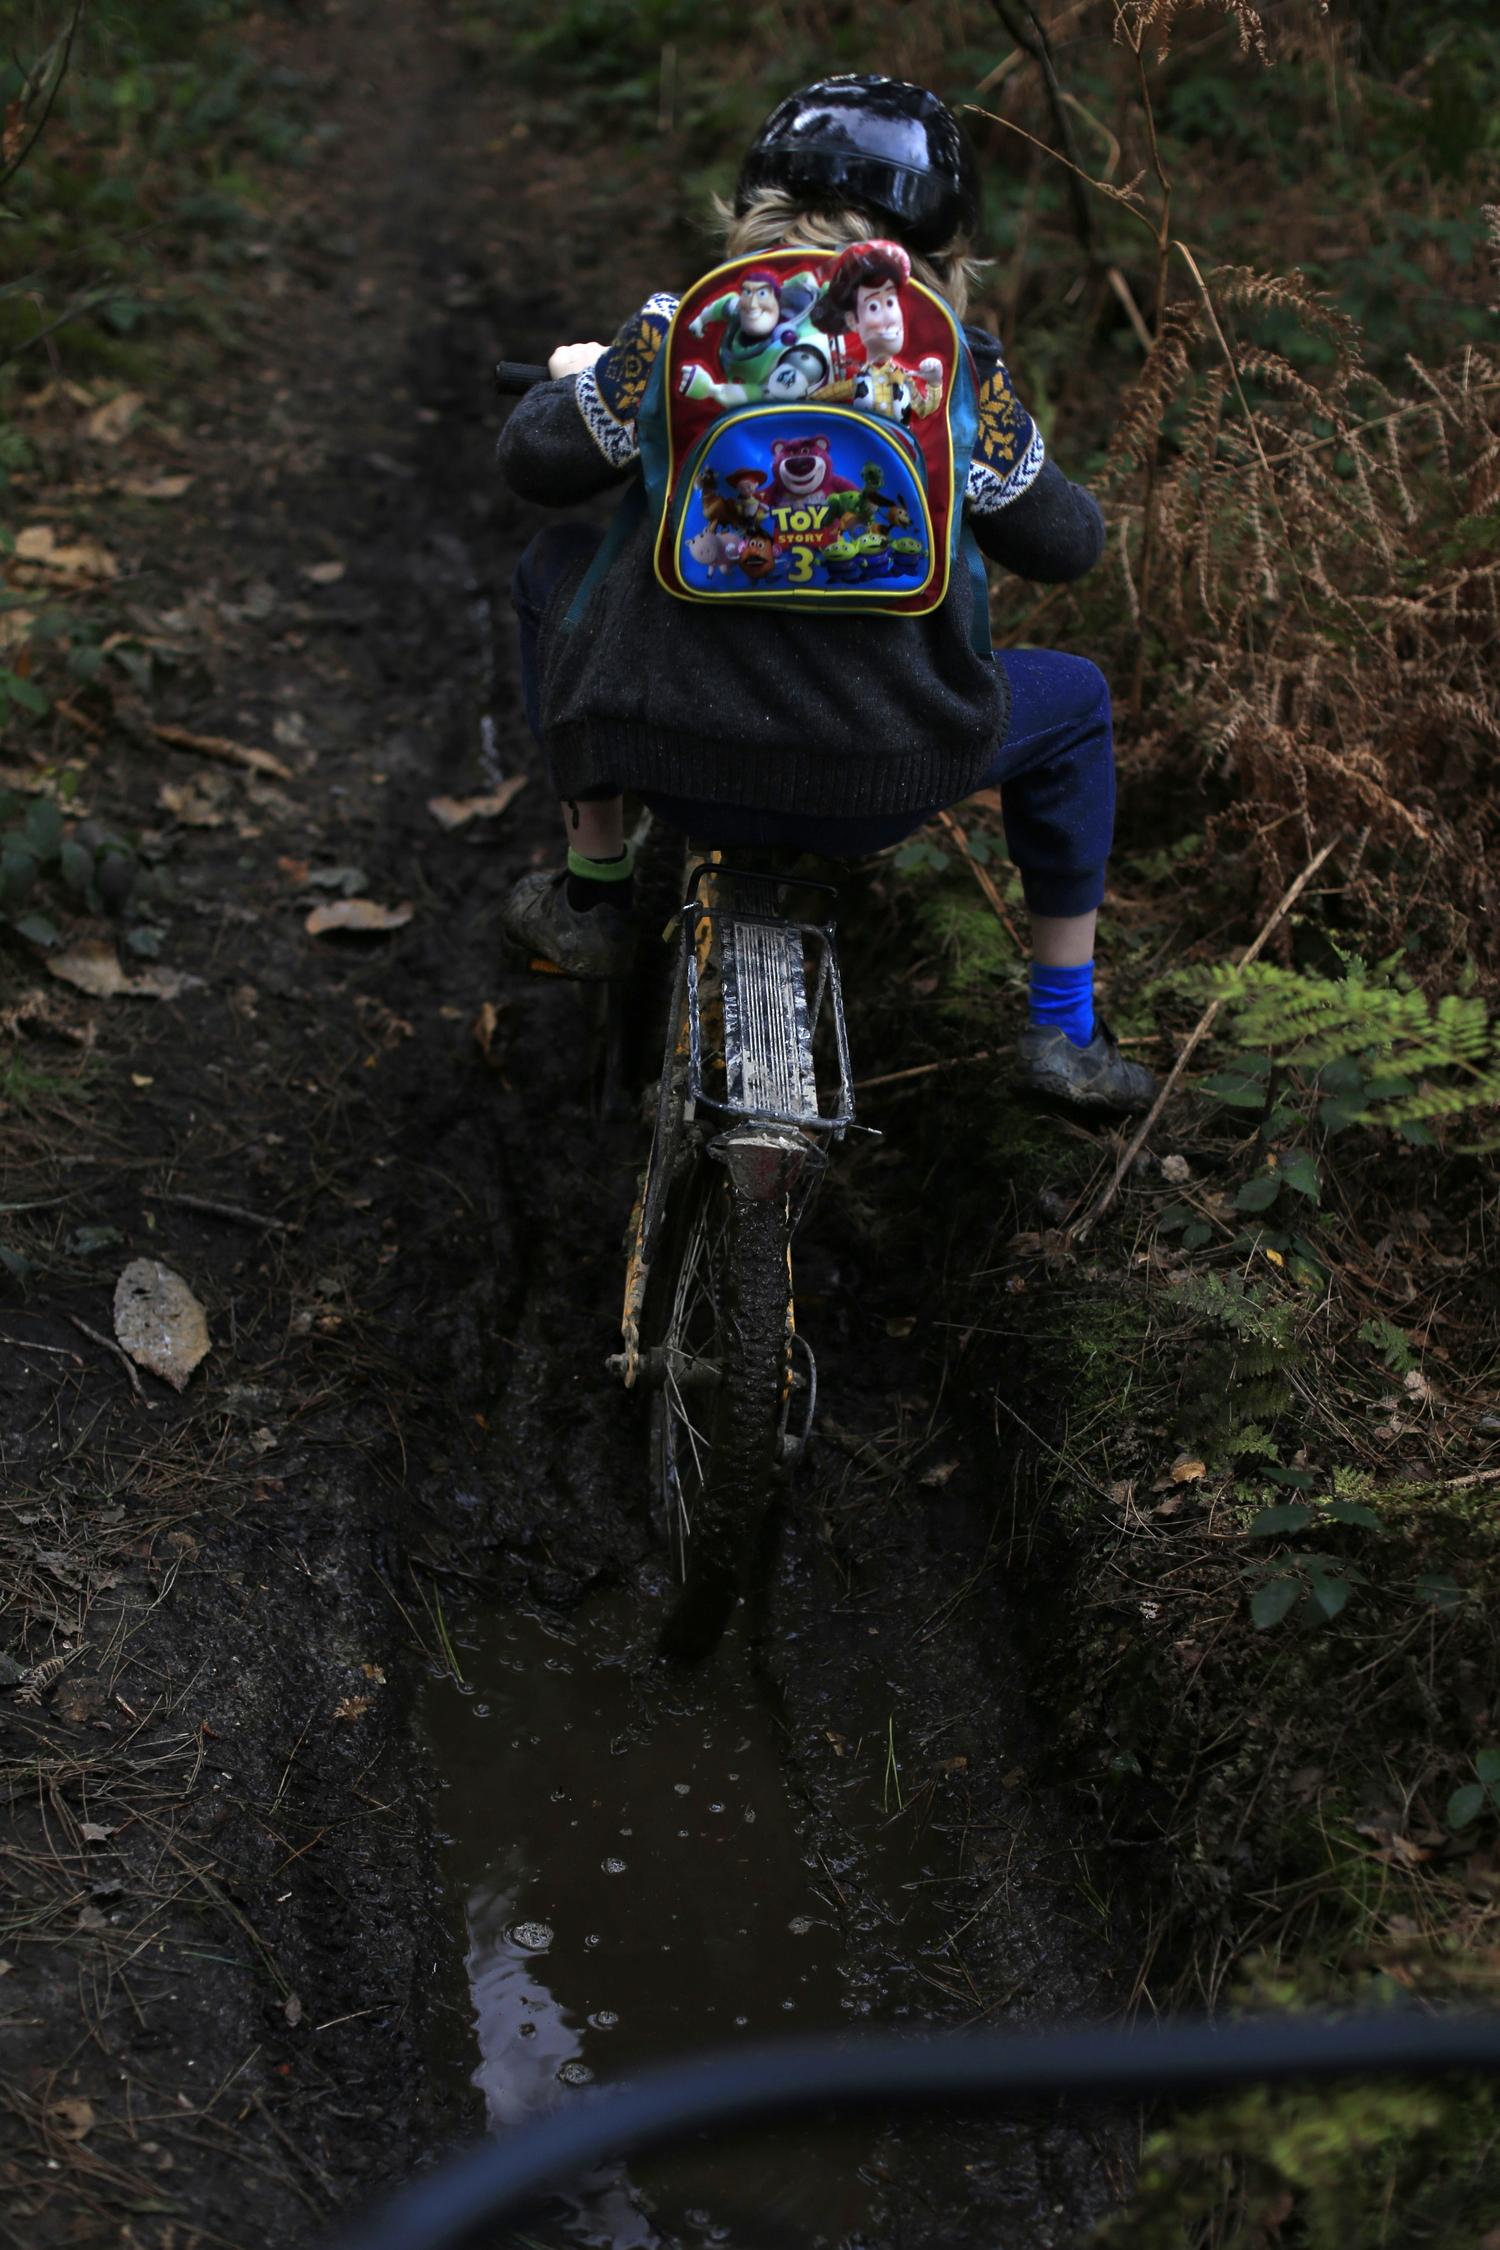 singletrack, off road, mtb, mountain biking, photo, cycle gear, maxxis